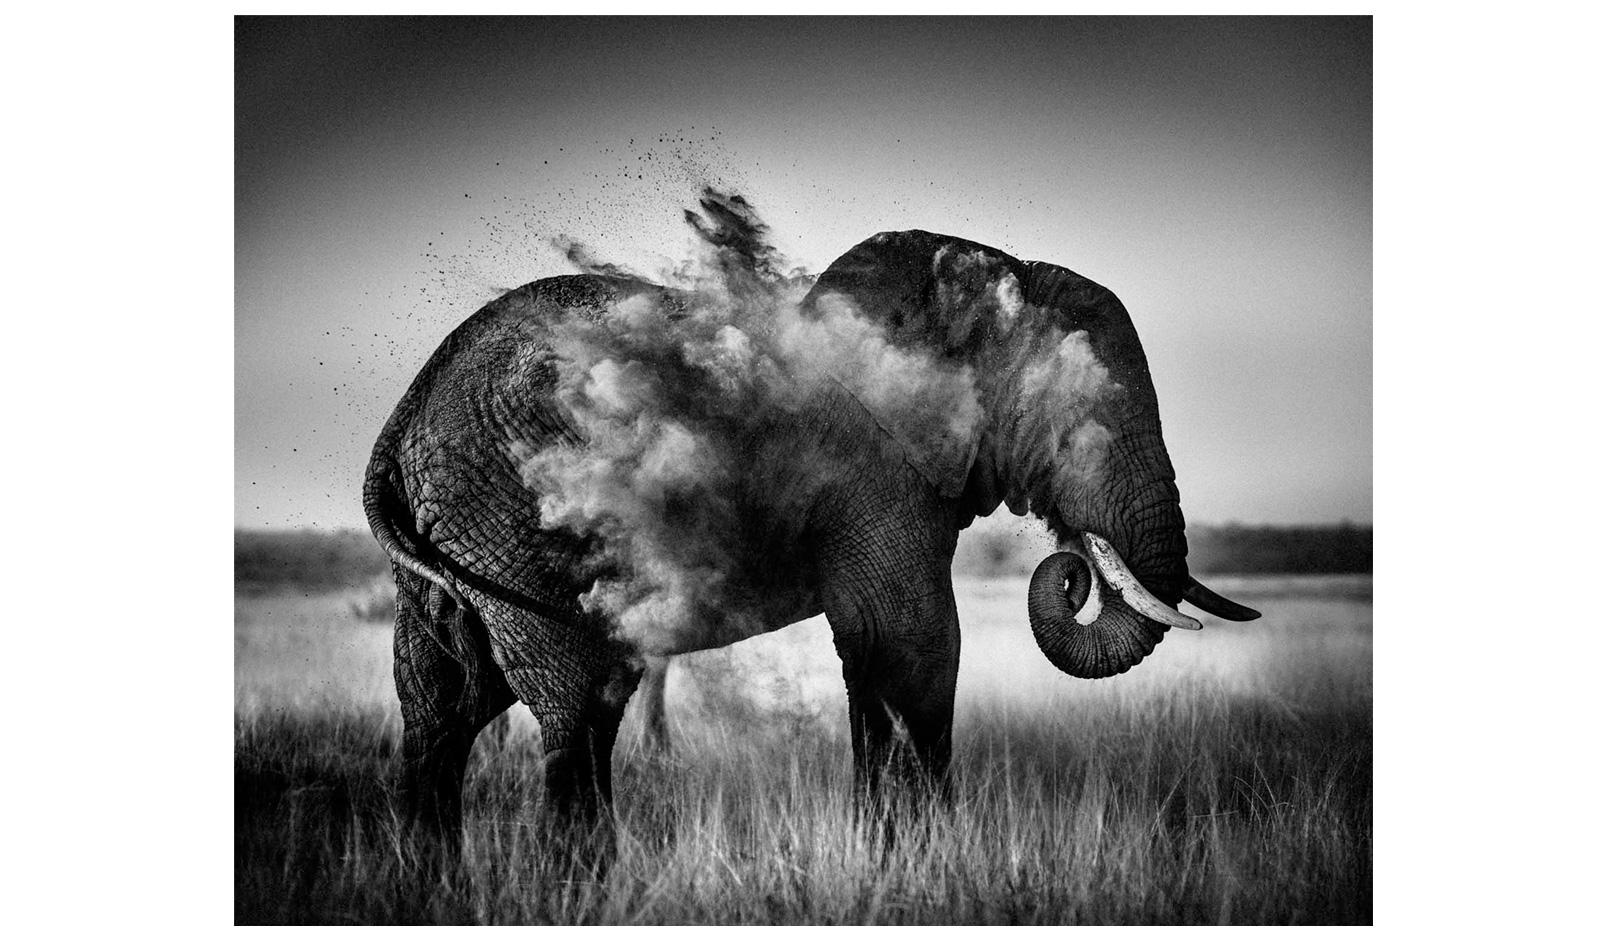 Elephant black and white dust